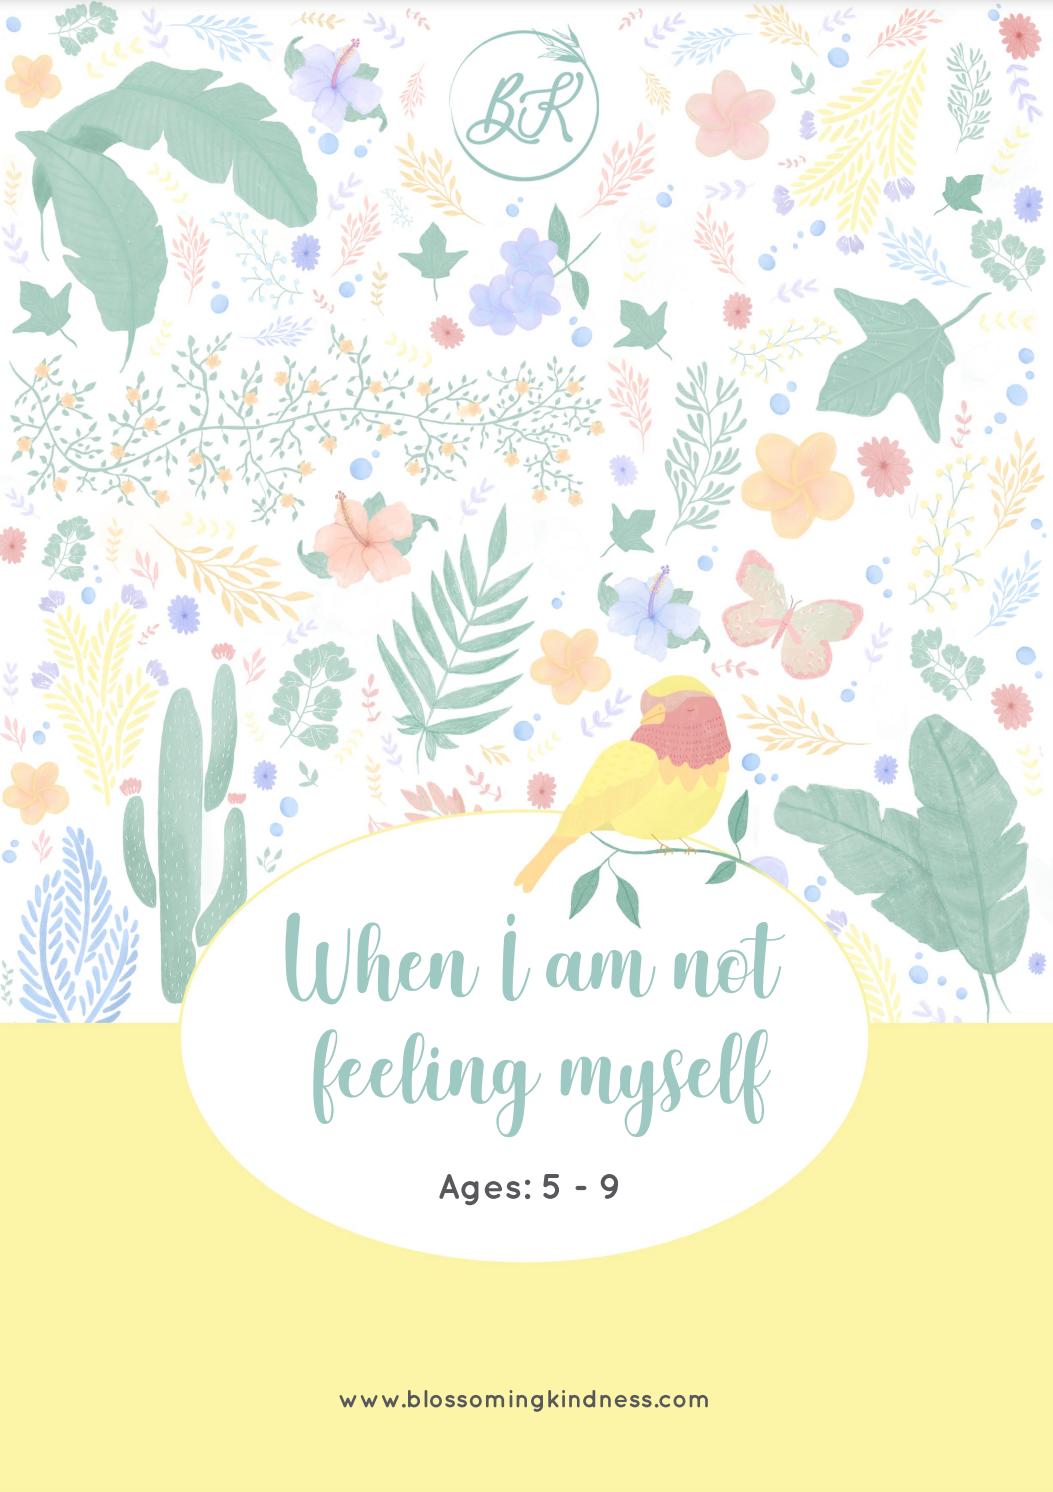 PDF file - When I am not feeling myself